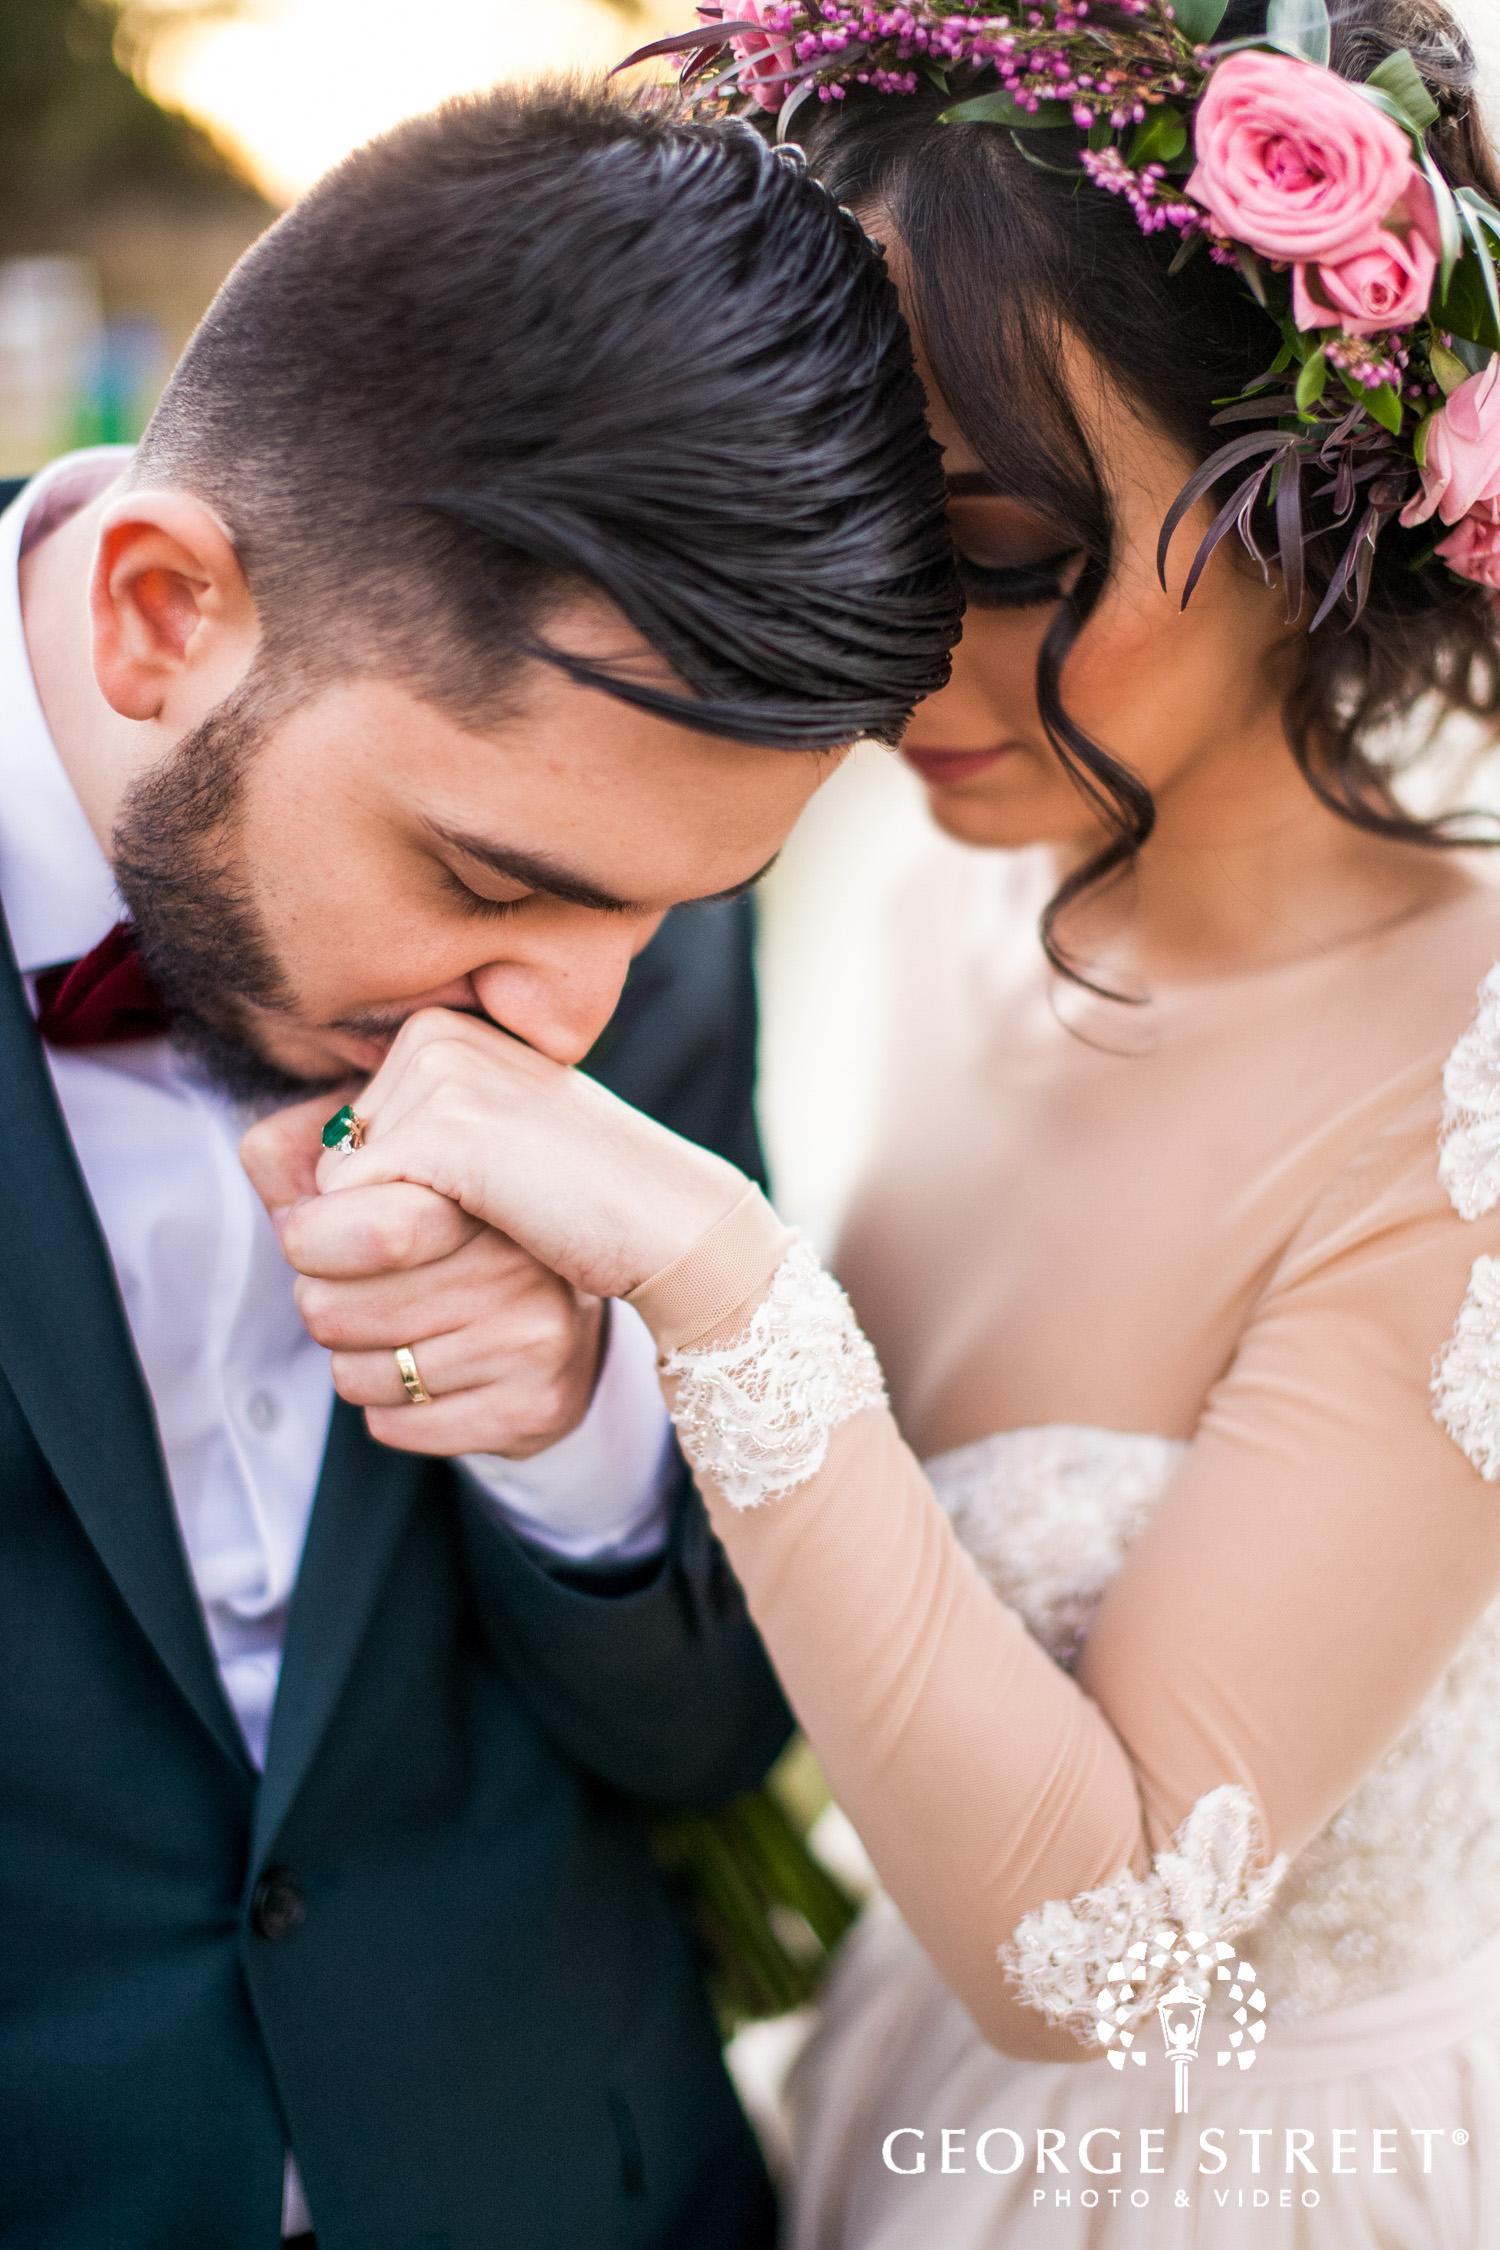 beautiful wedding portrait of bride and groom Austin